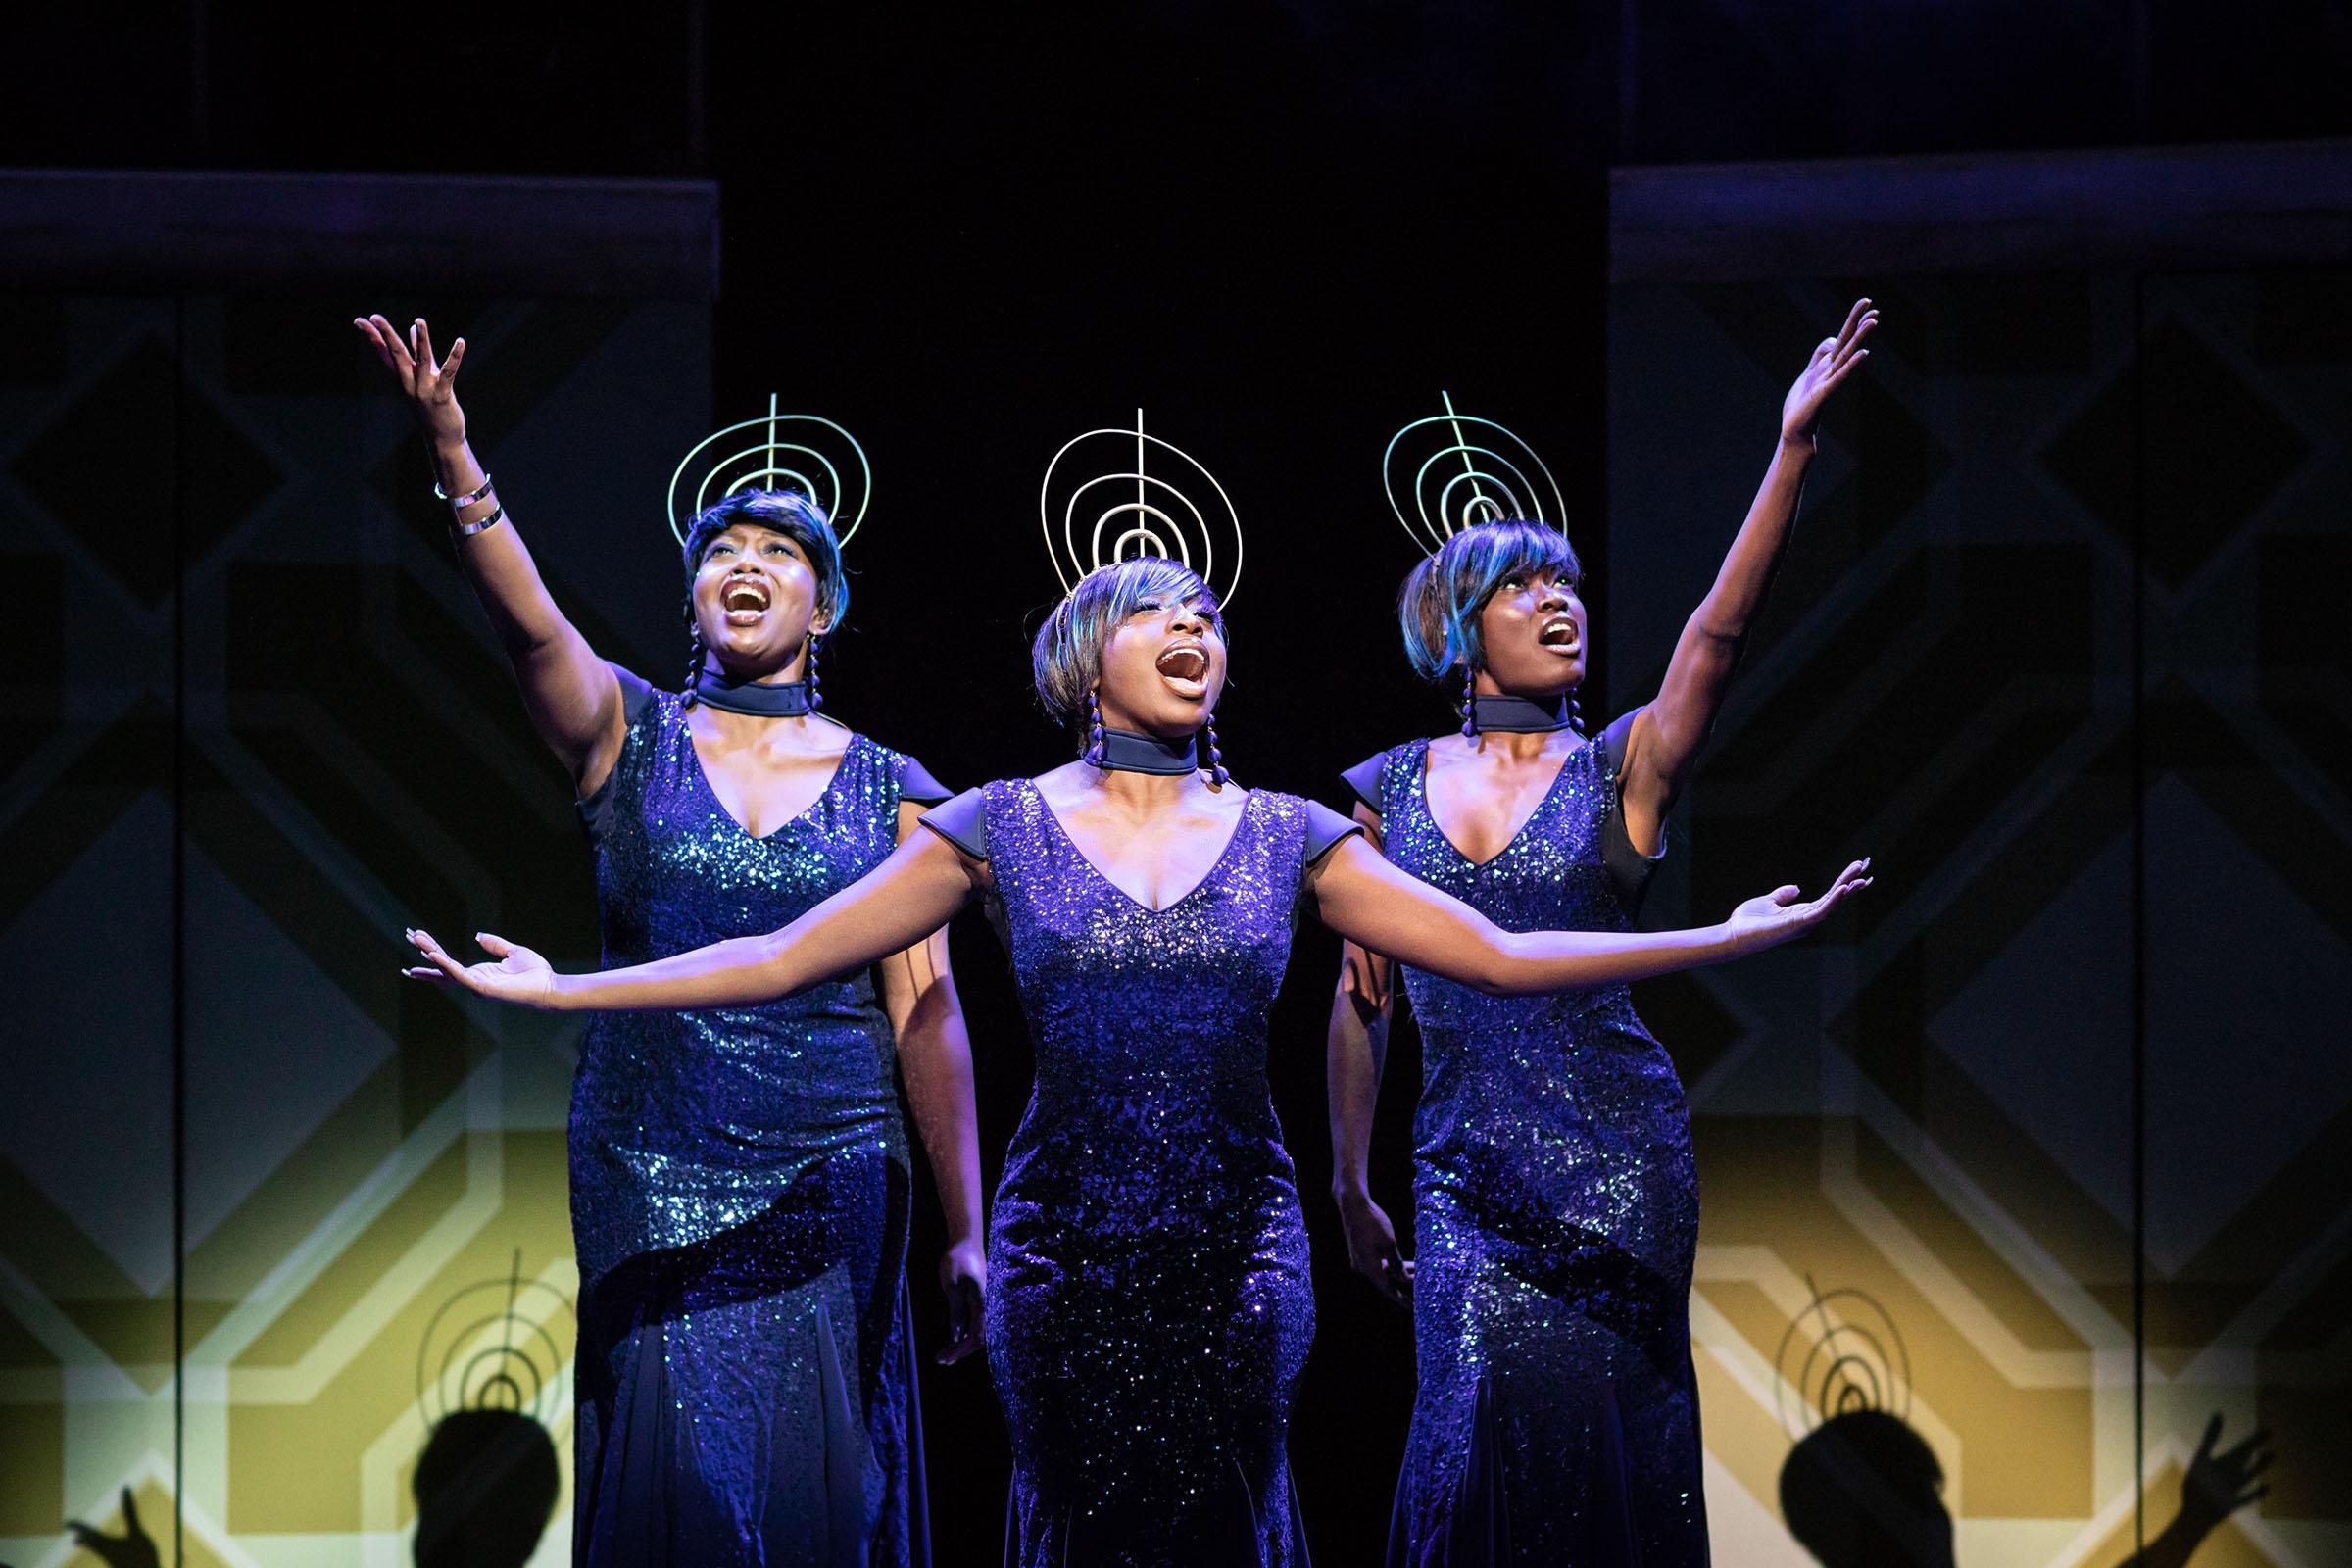 Keisha Amponsa Banson (Radio 3), Dujonna Gift-Simms (Radio 1) and Tanisha Spring (Radio 2)